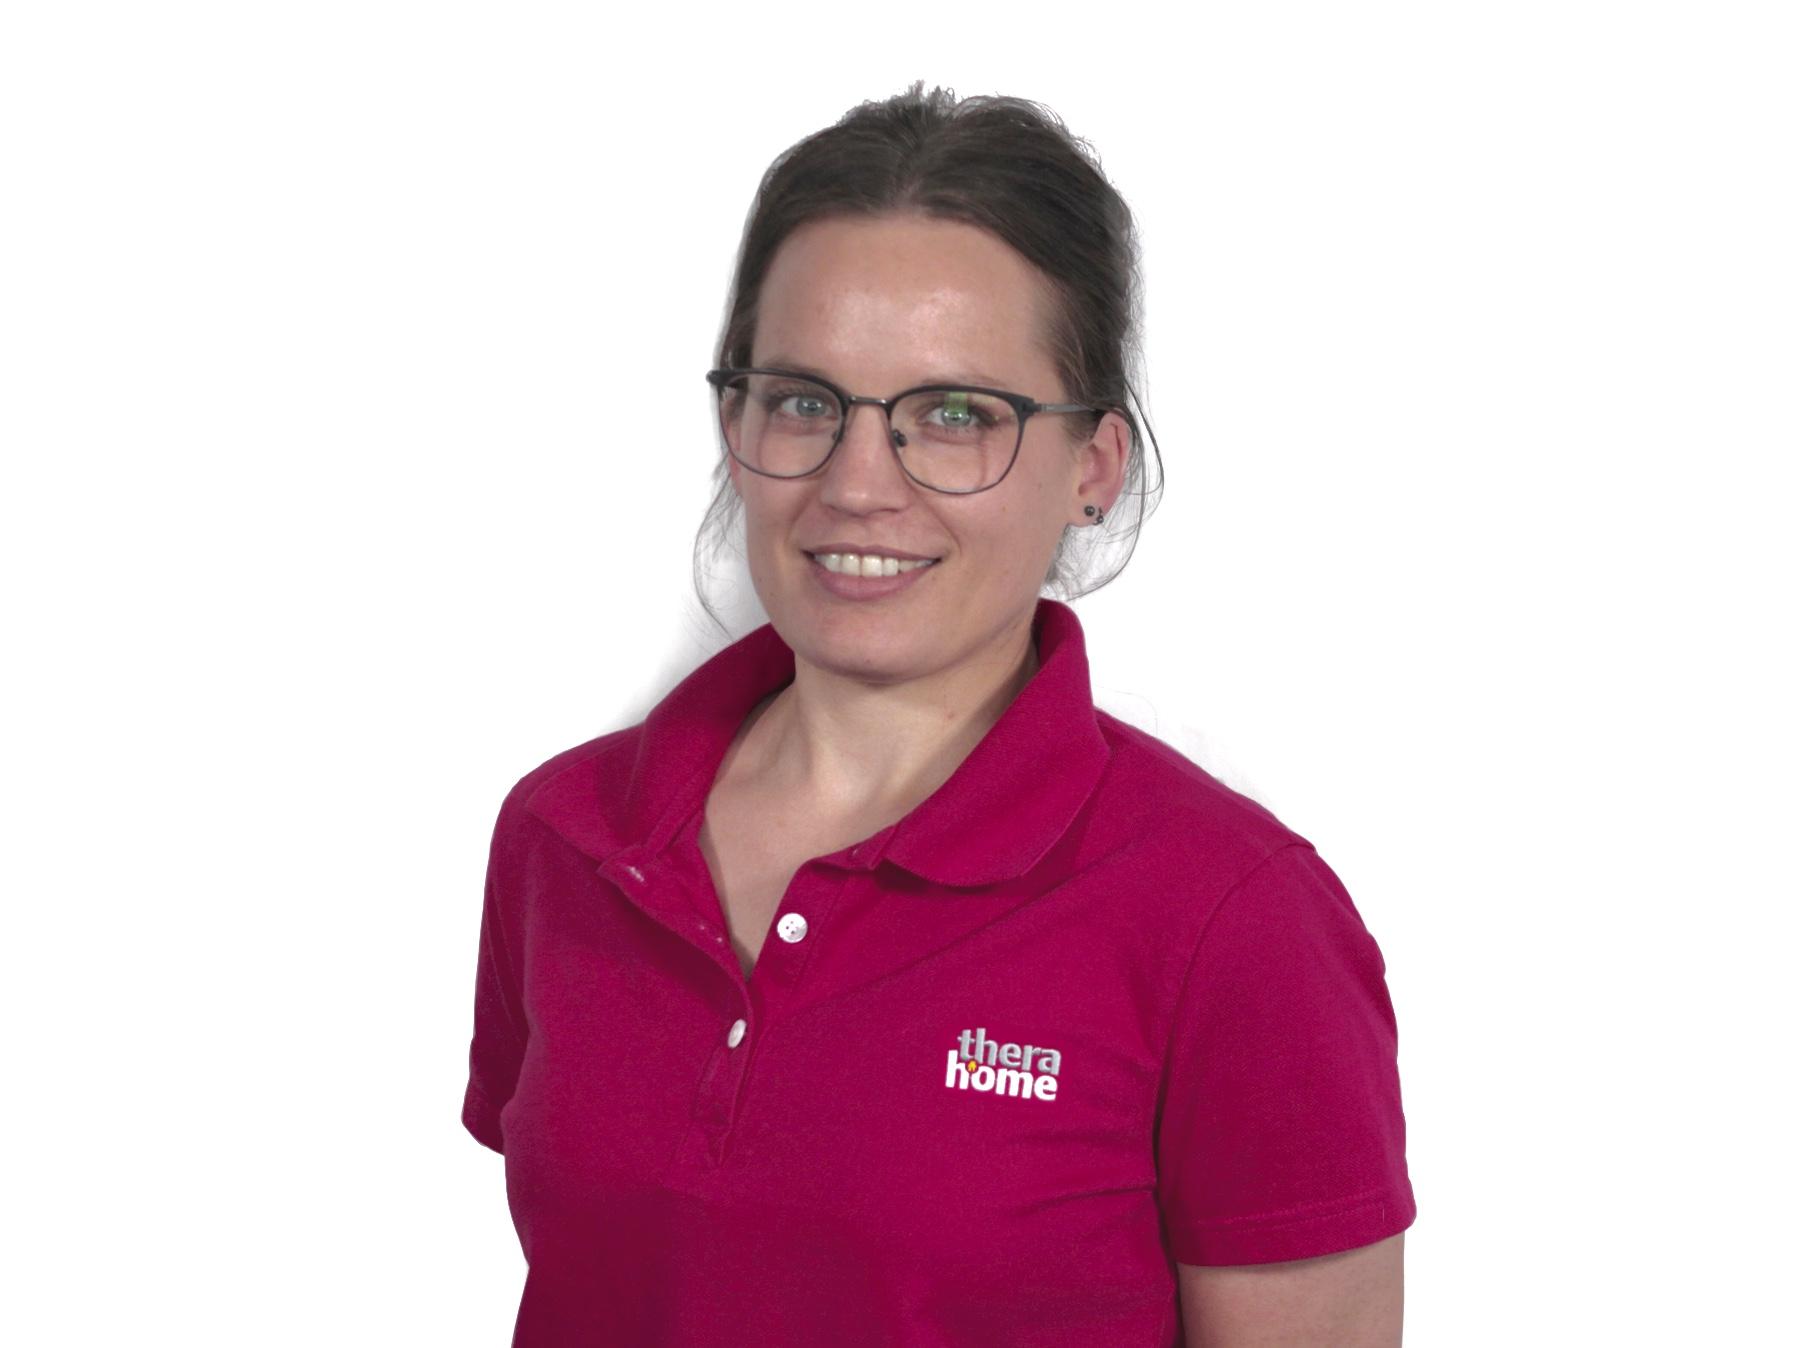 Monika Soehnle